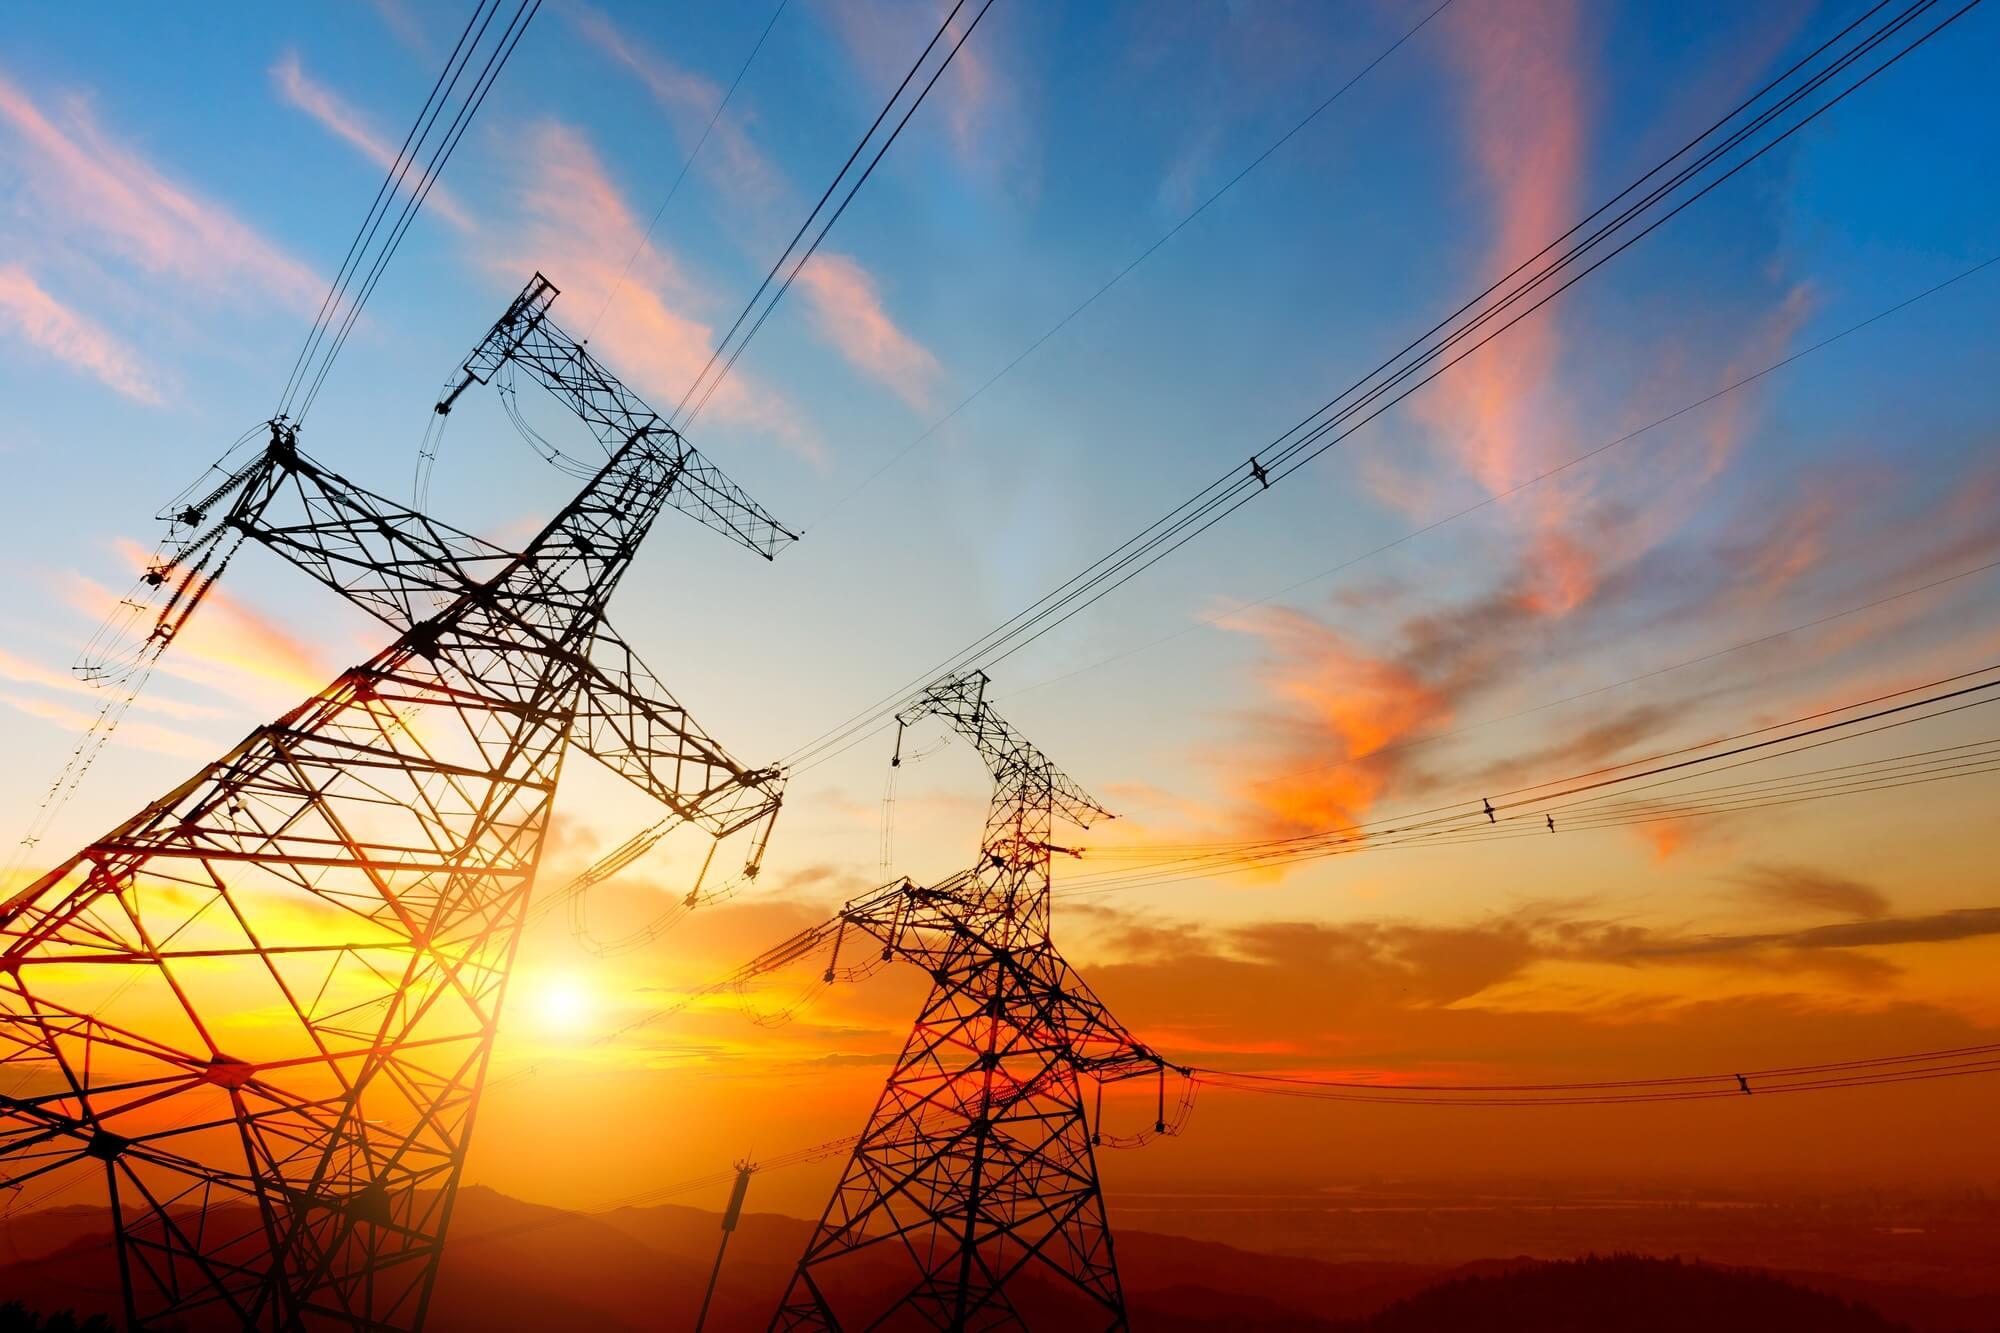 Енергосистеми України та ЄС будуть спільними